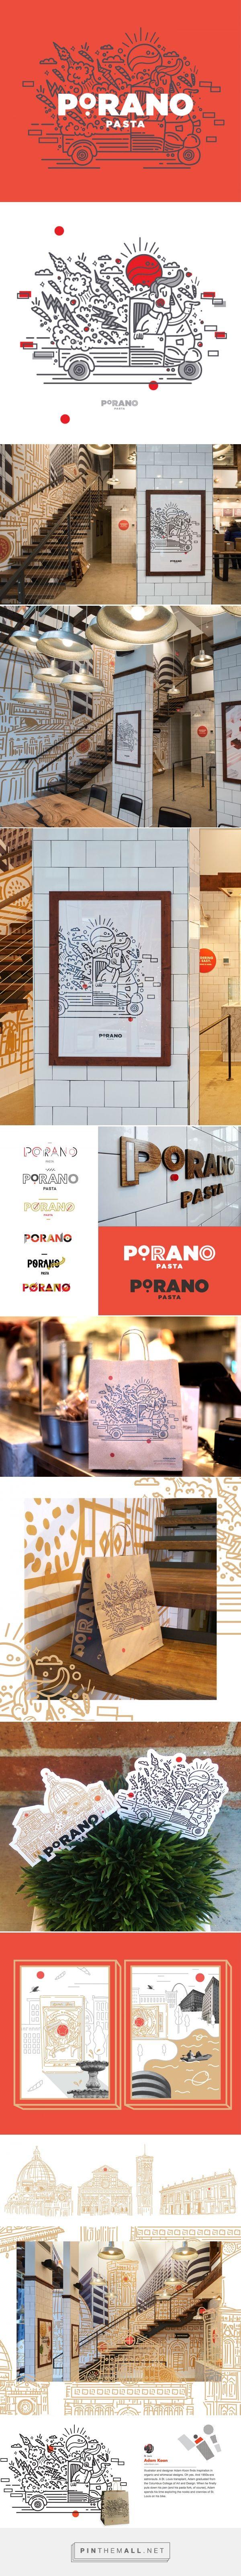 Porano on Behance - created via https://pinthemall.net